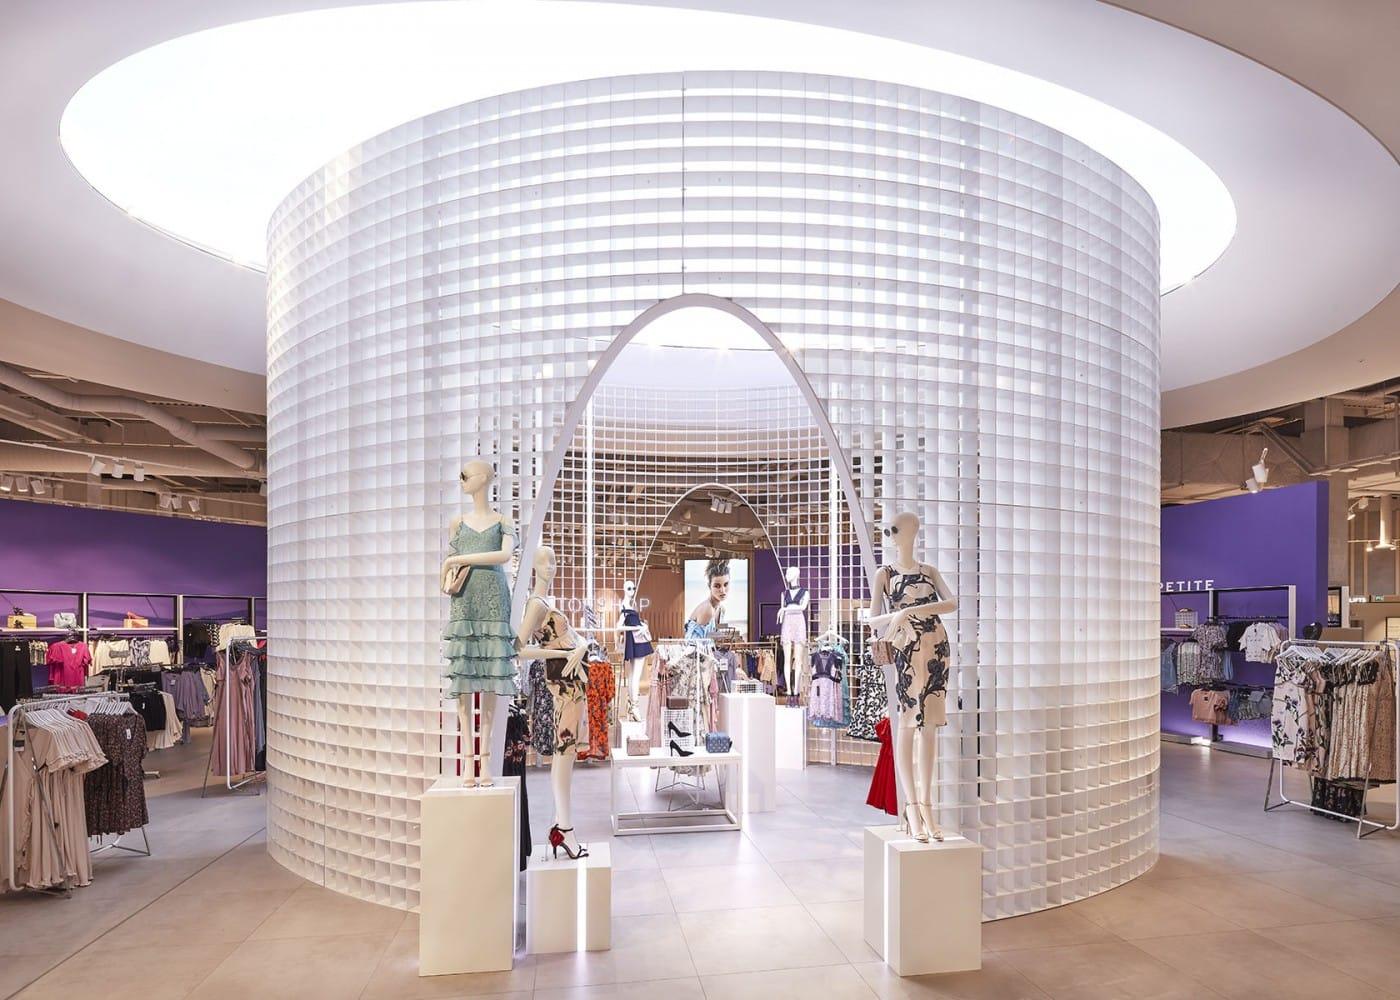 retail lighting design: Topshop clothes display